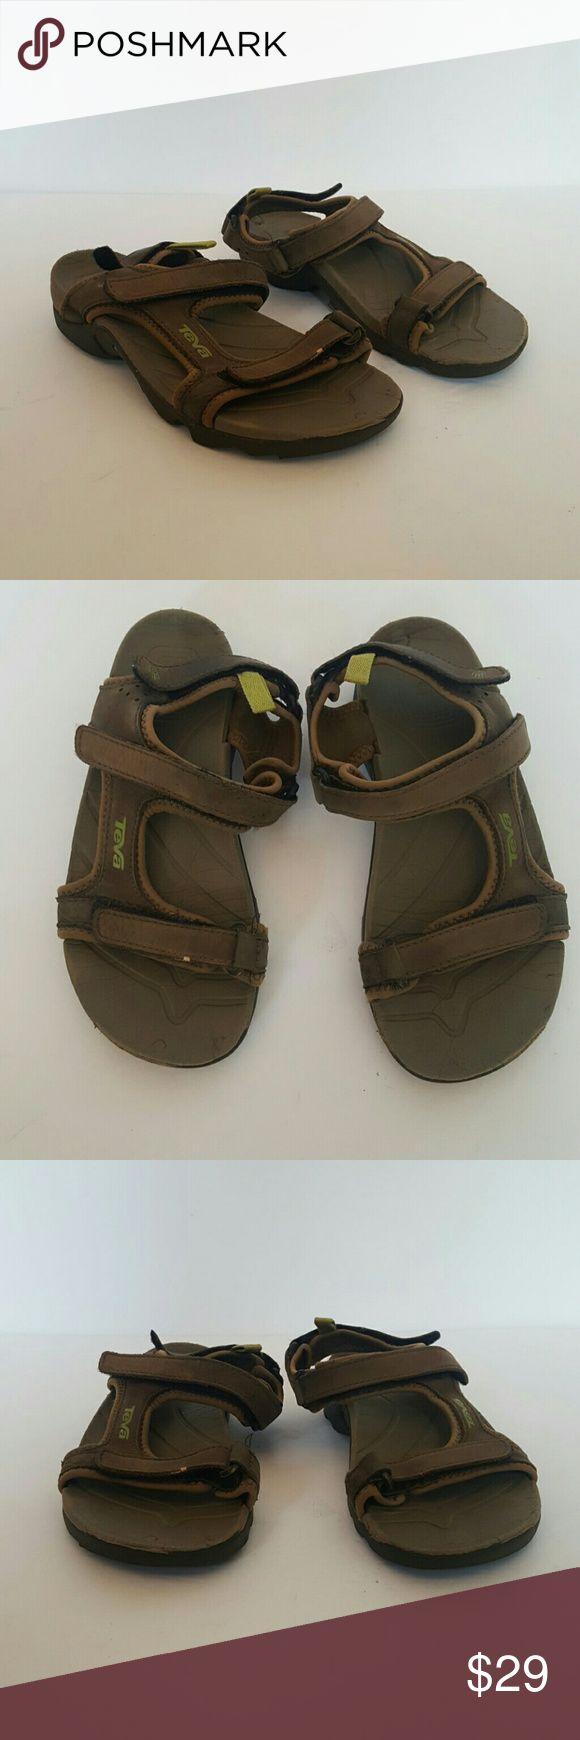 TEVA KIDS SIZE 2 SANDALS SHOES VELCRO STRAP TEVAS YOUTH SIZE 2 SANDALS OPEN TOE VELCRO SHOES SIZE 2 BROWN AND GREEN LEATHER Teva Shoes Sandals & Flip Flops